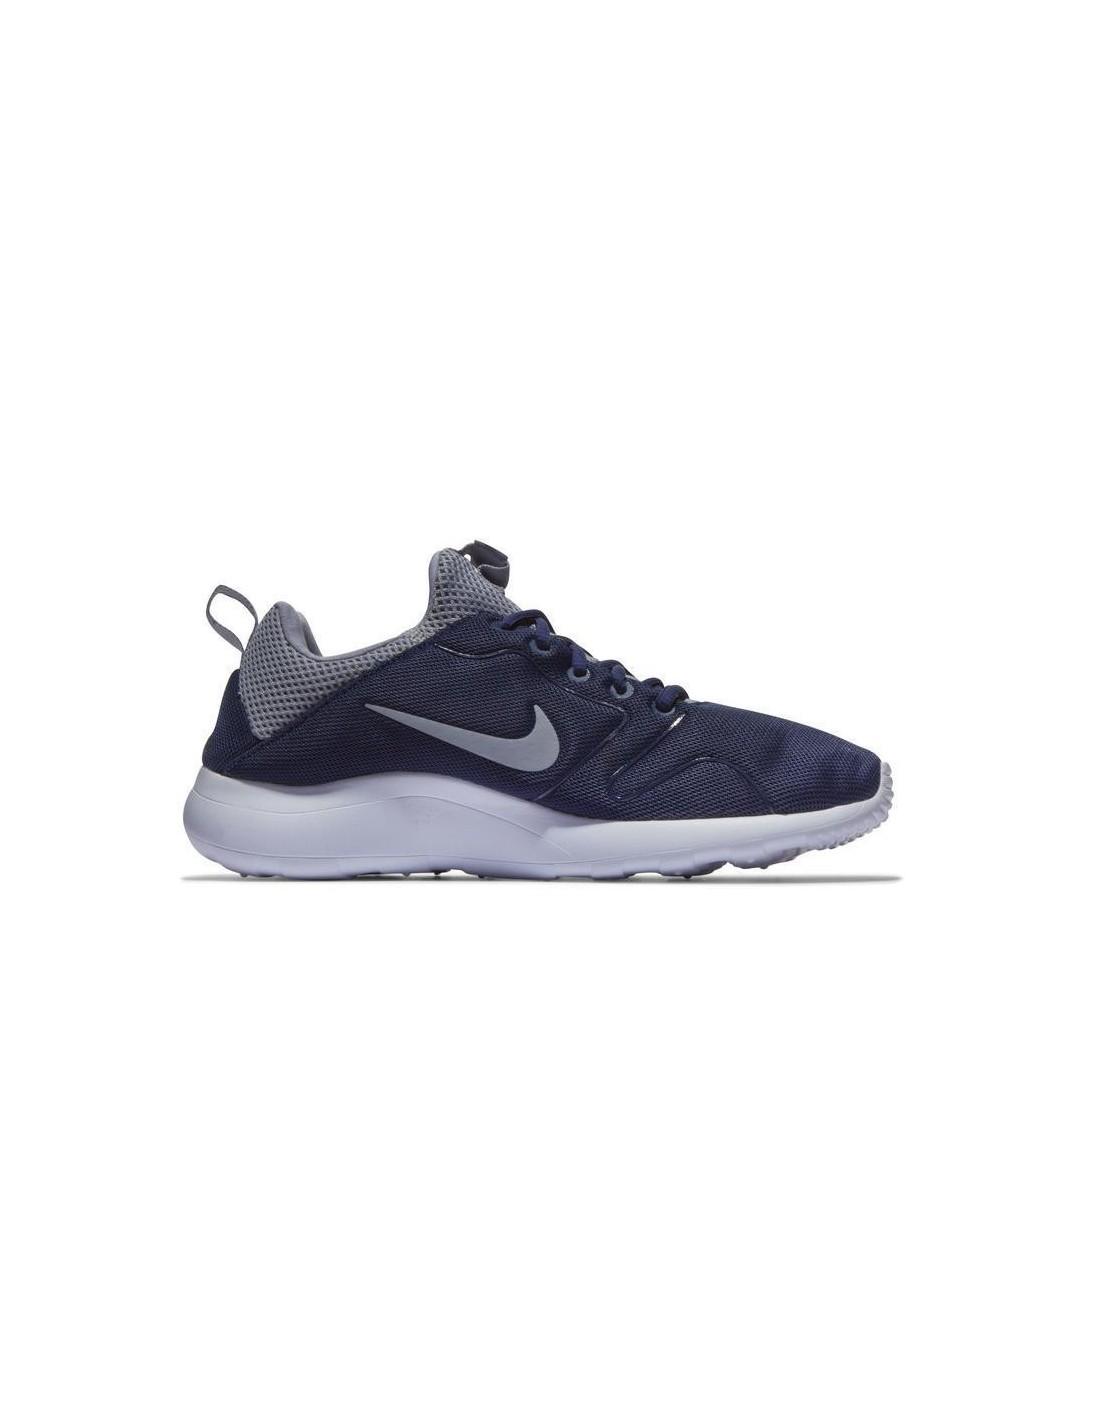 2 Rrscf8ryu 0 Navy Nike White Kaishi Grey wAIYgE7tq